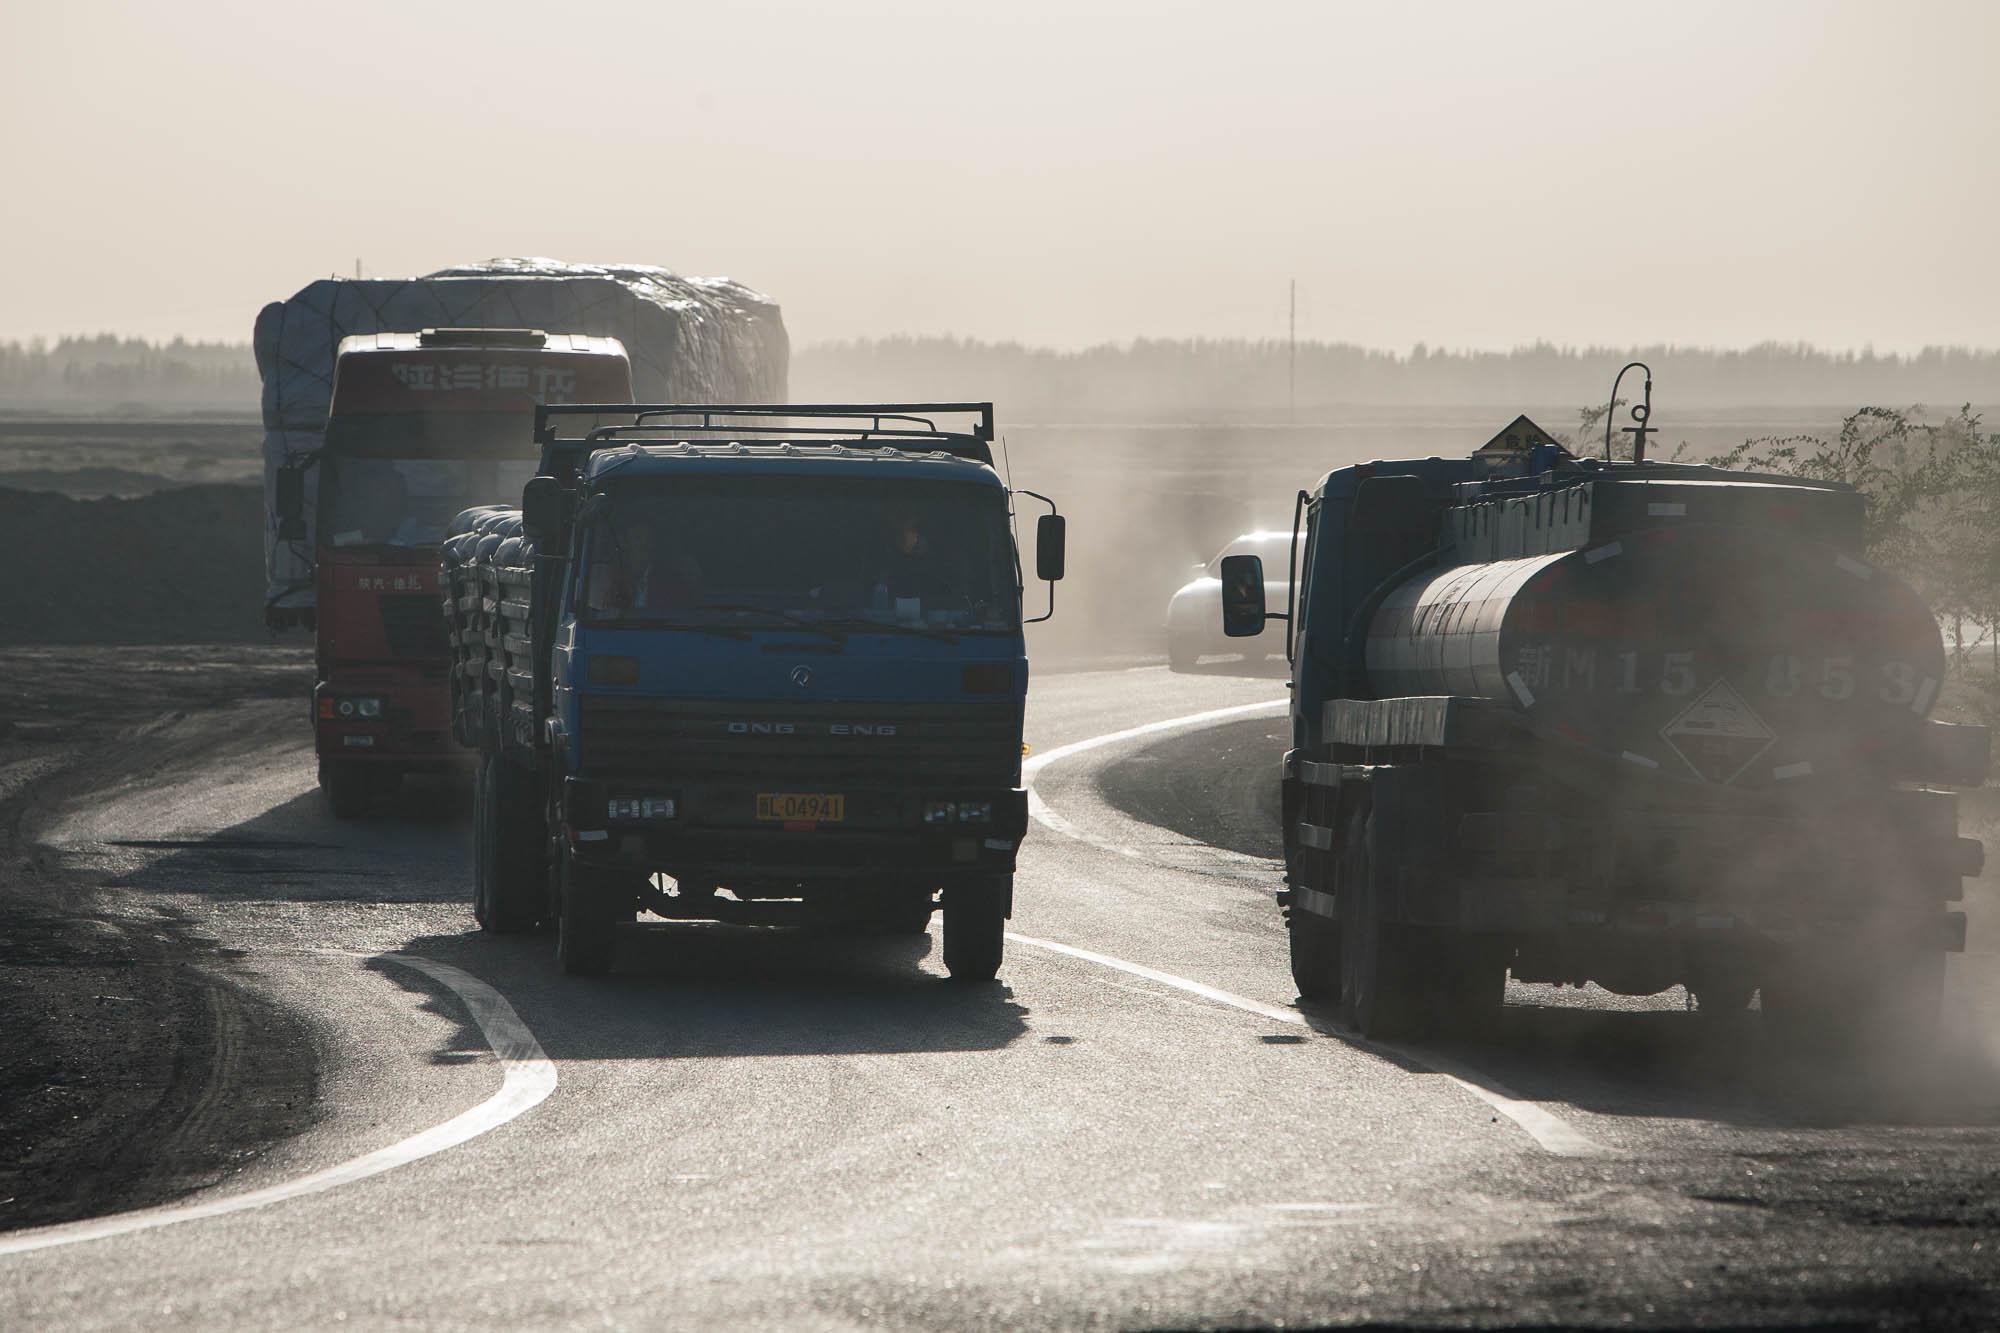 trucks on a curvy road